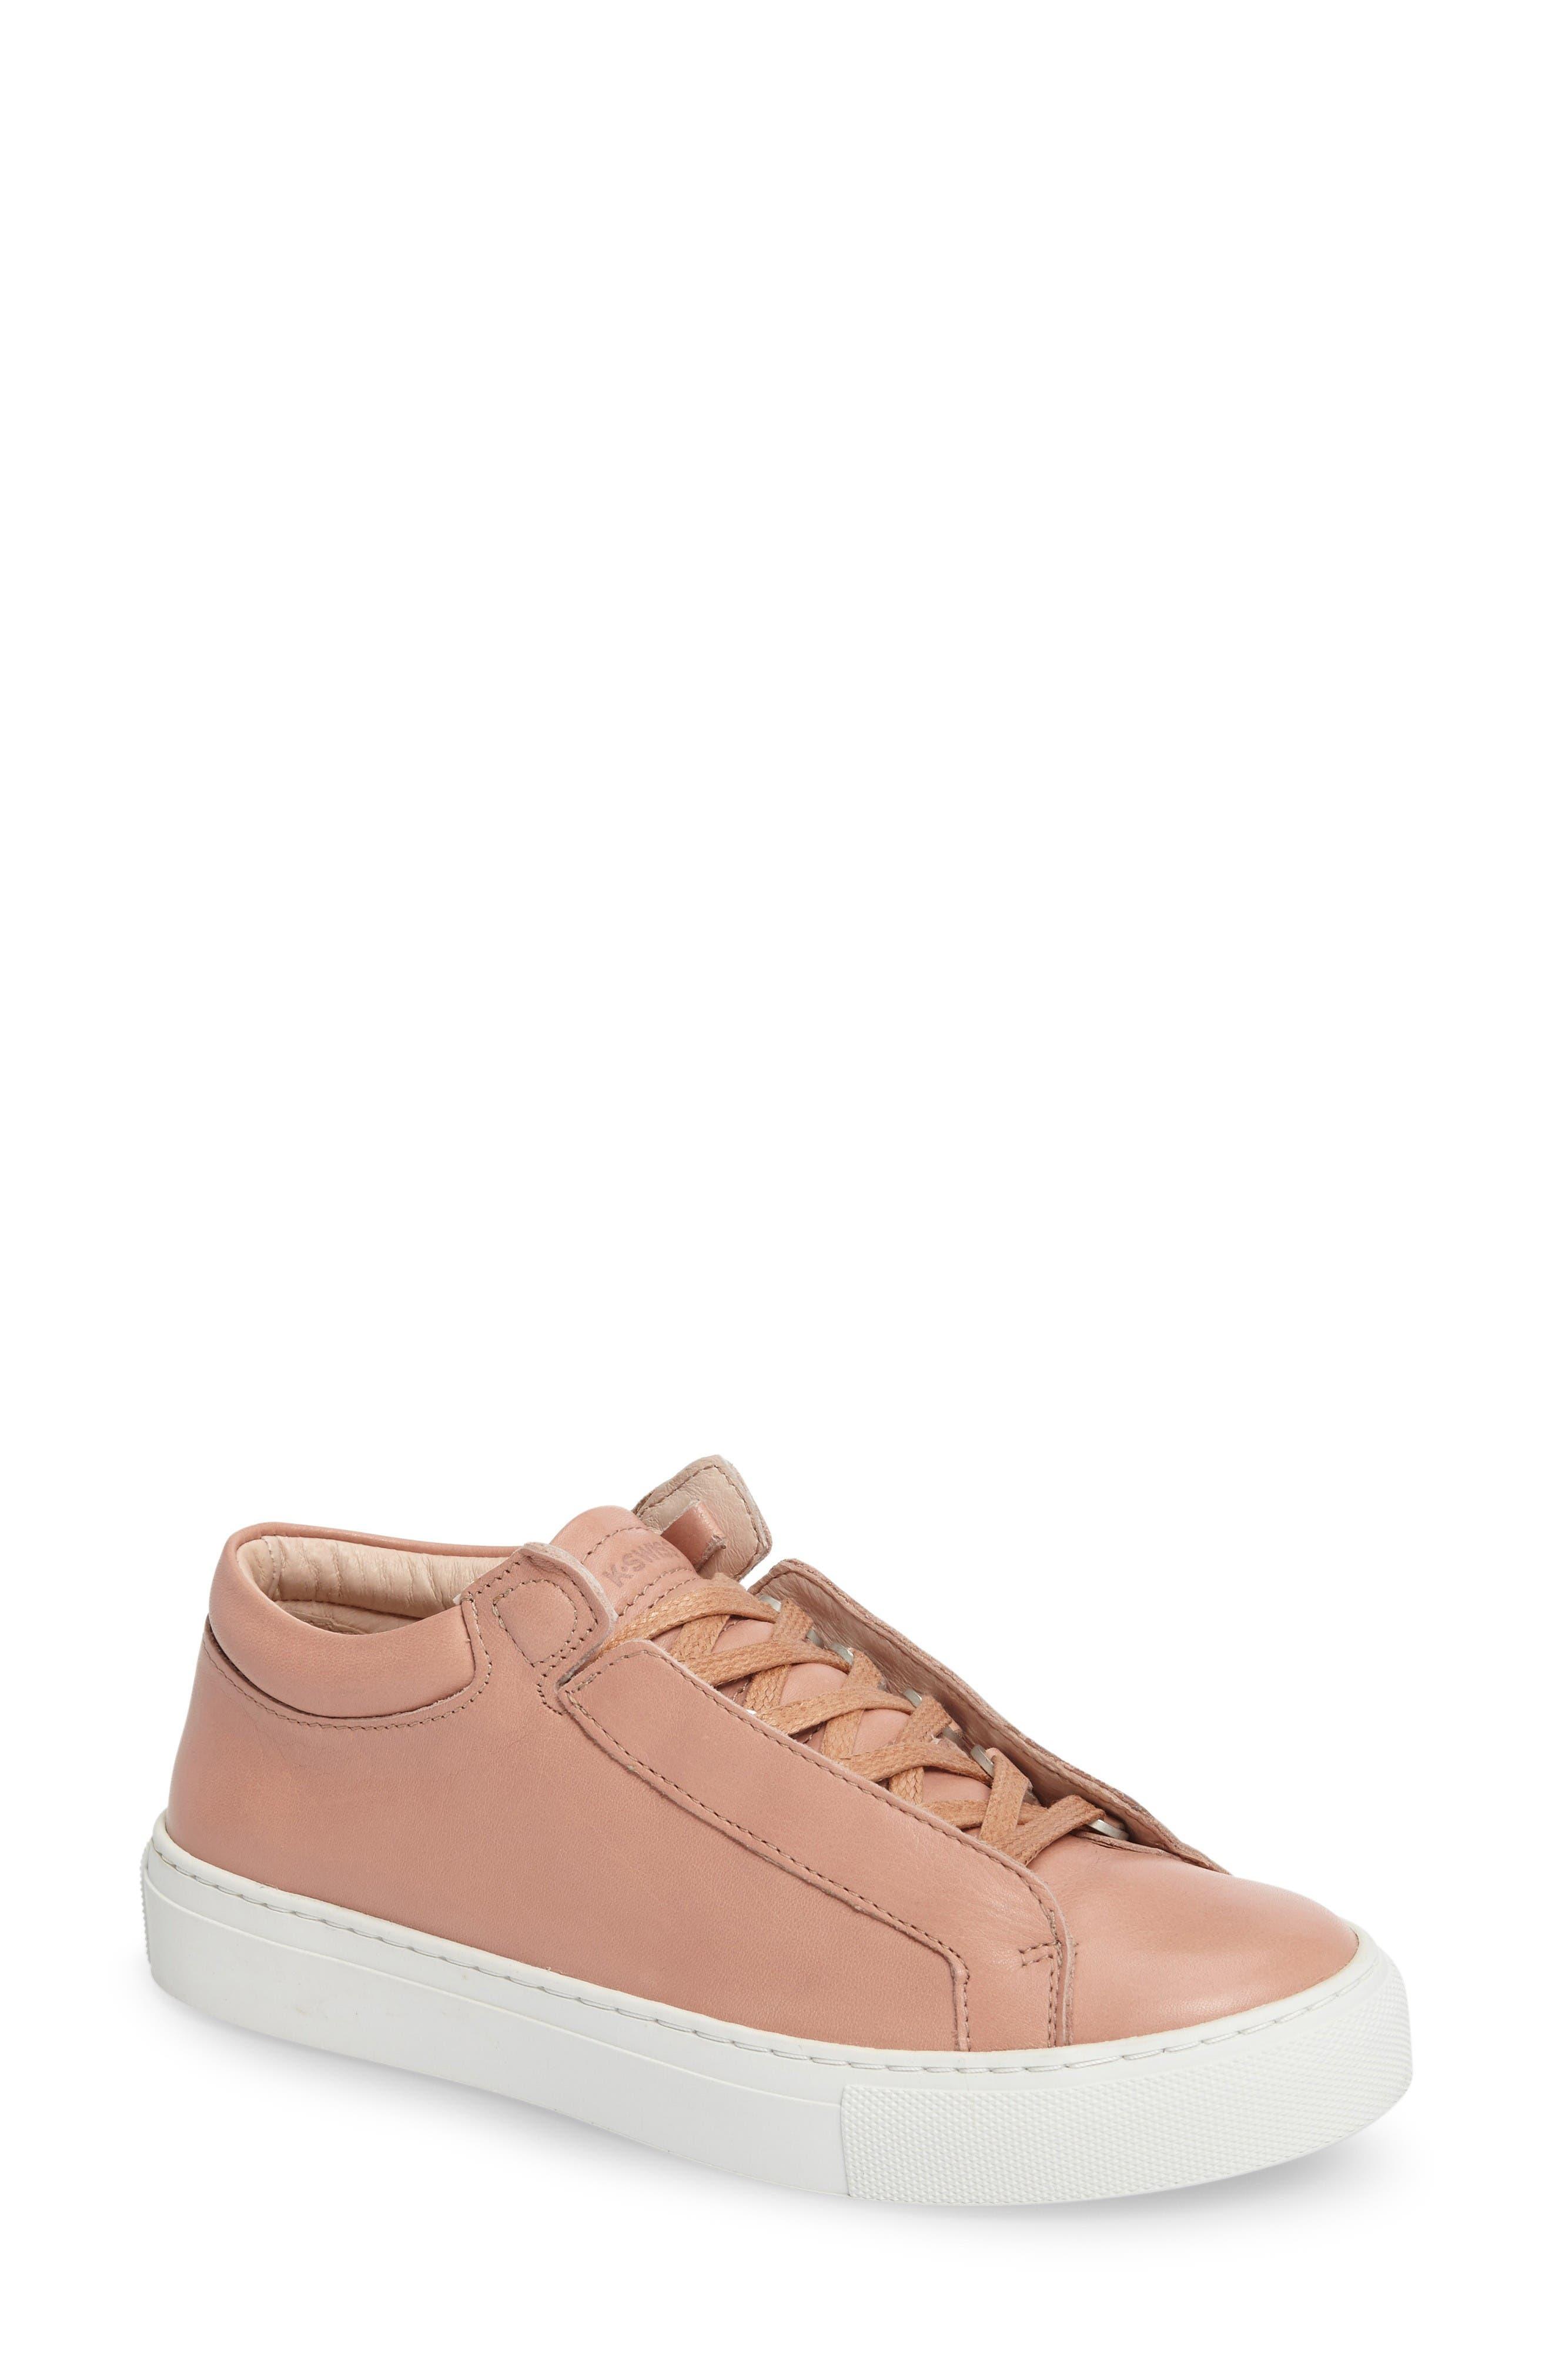 Main Image - K-Swiss Novo Demi Sneaker (Women)